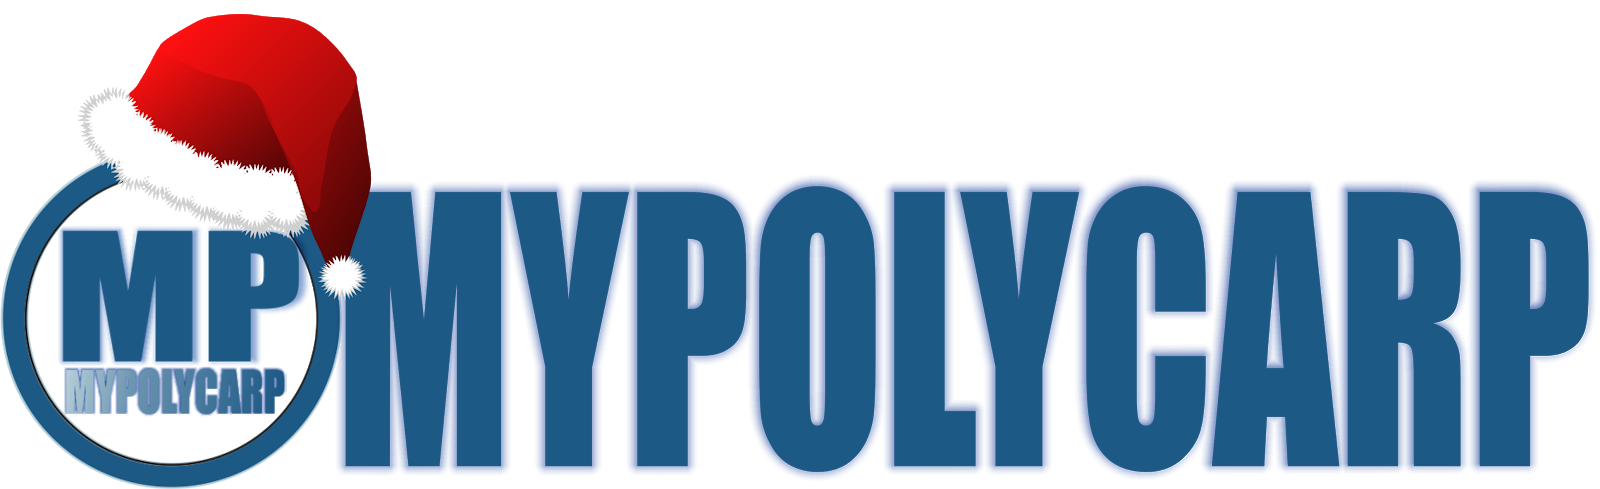 MYPOLYCARP